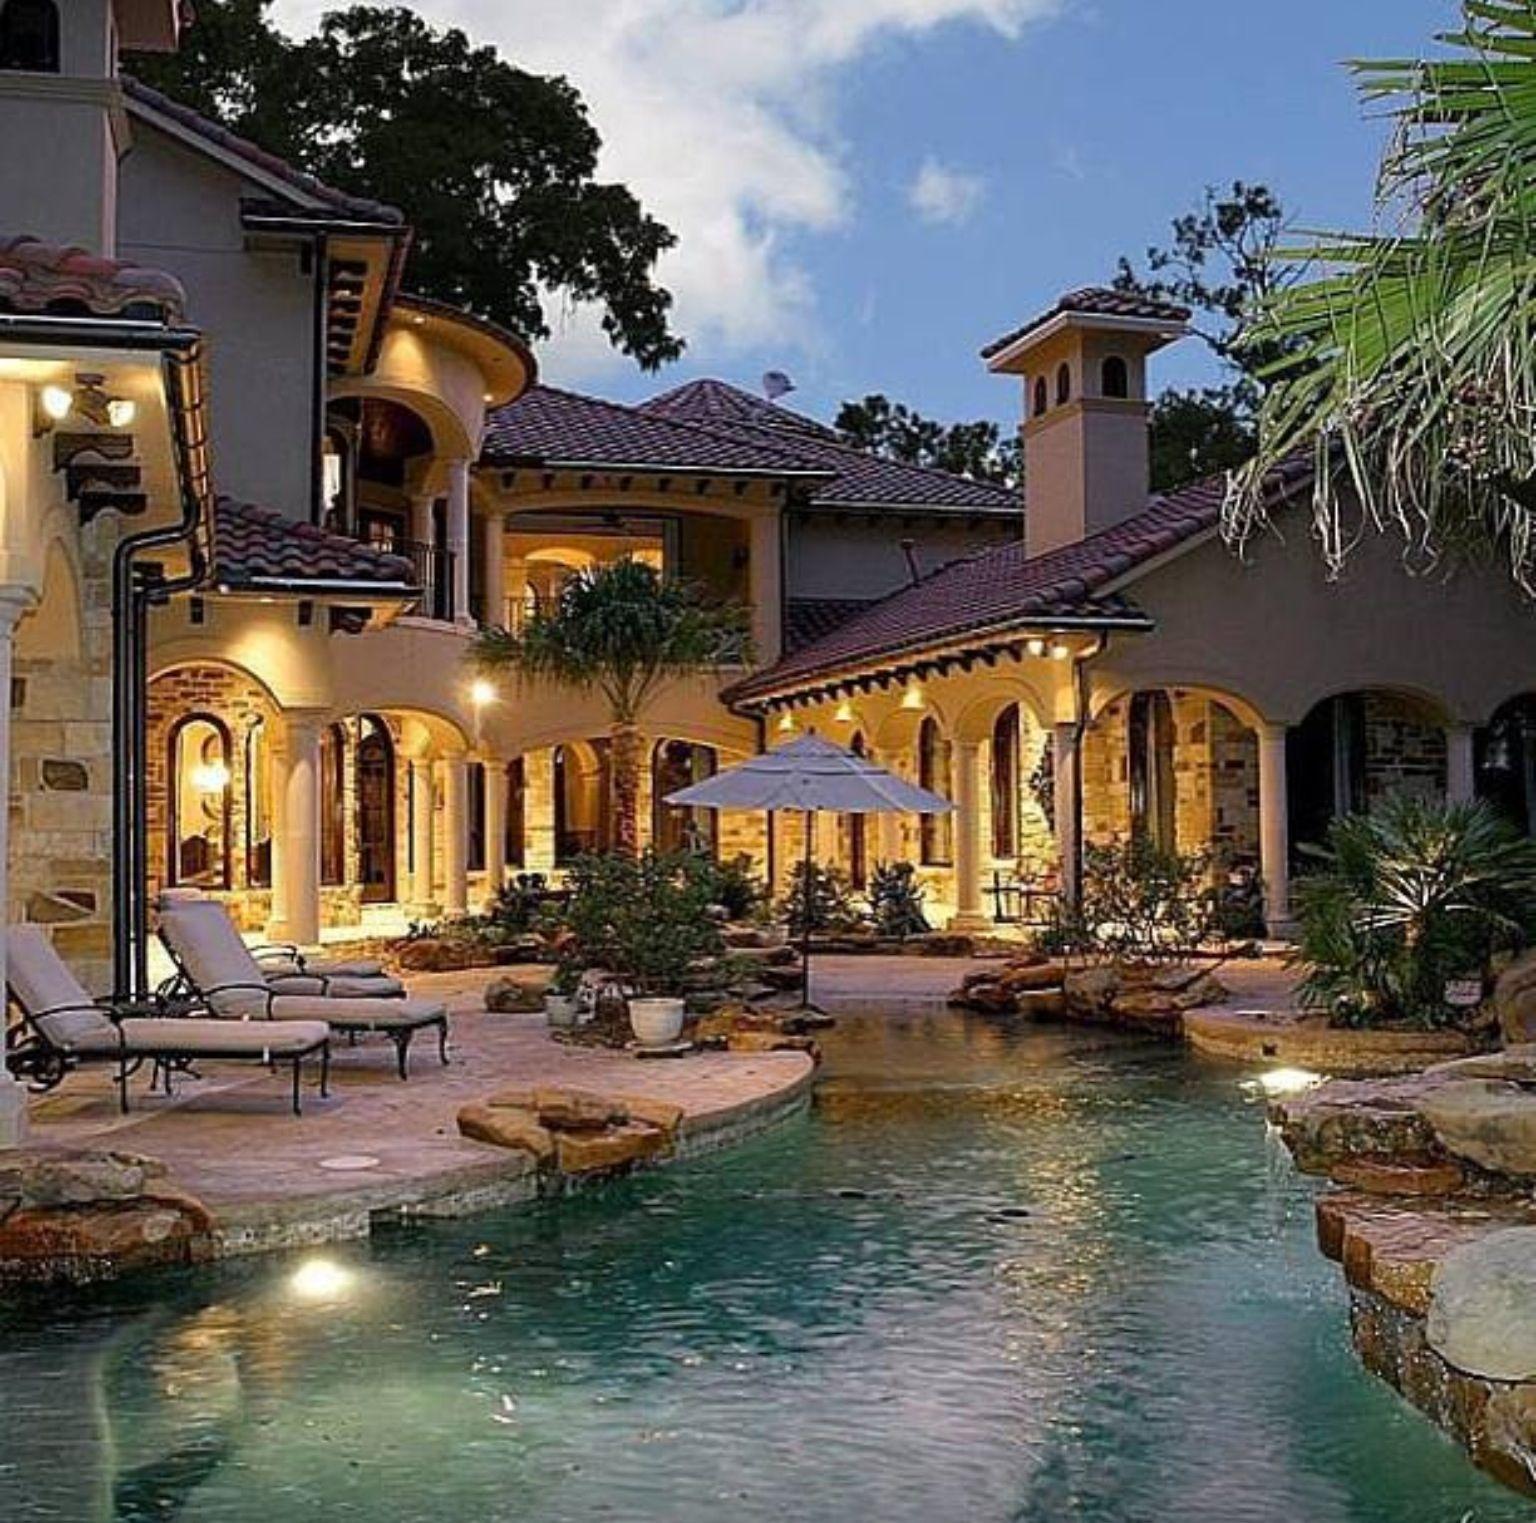 Outdoor Patio/pool